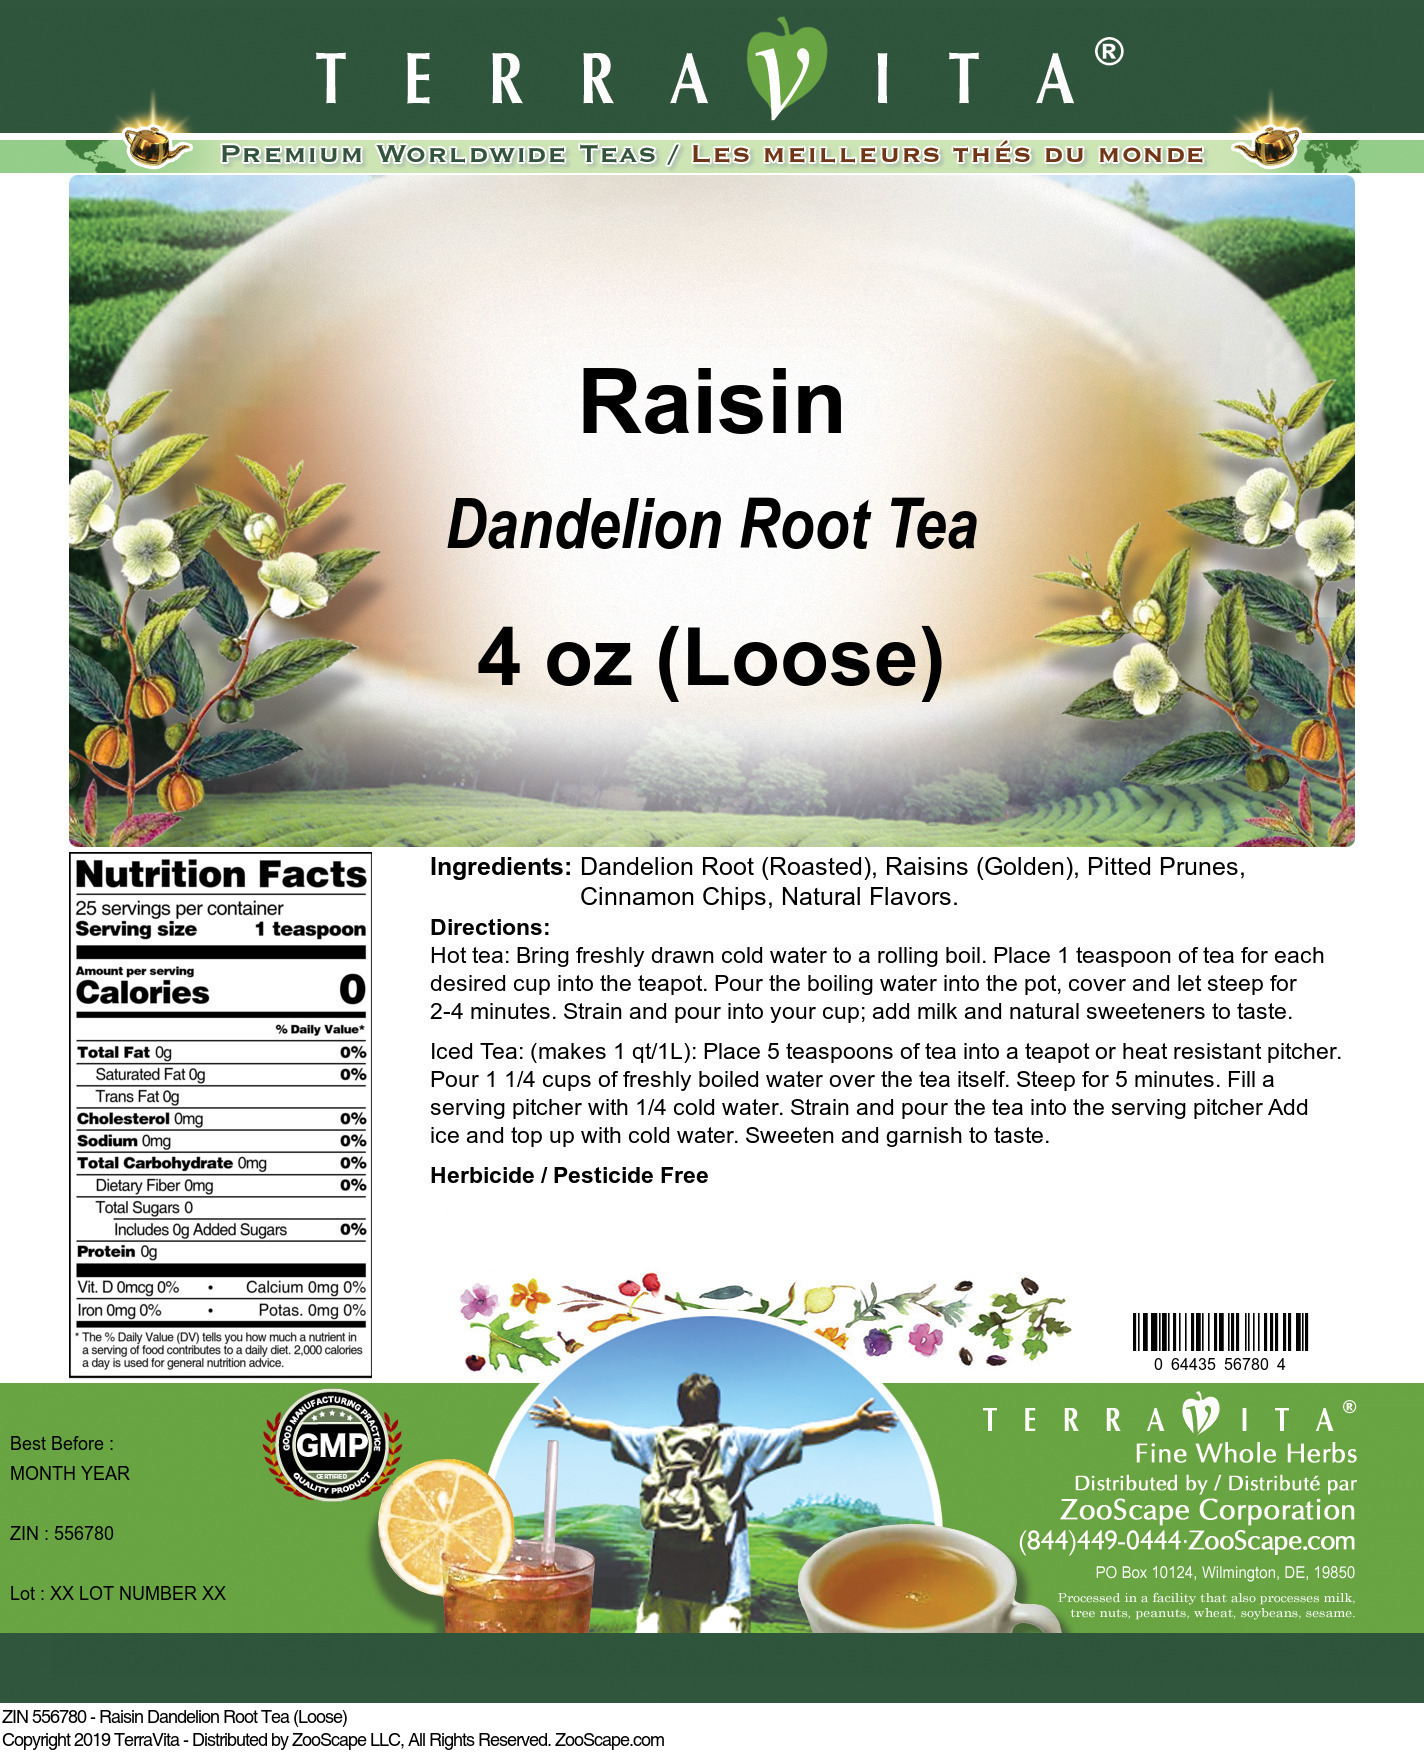 Raisin Dandelion Root